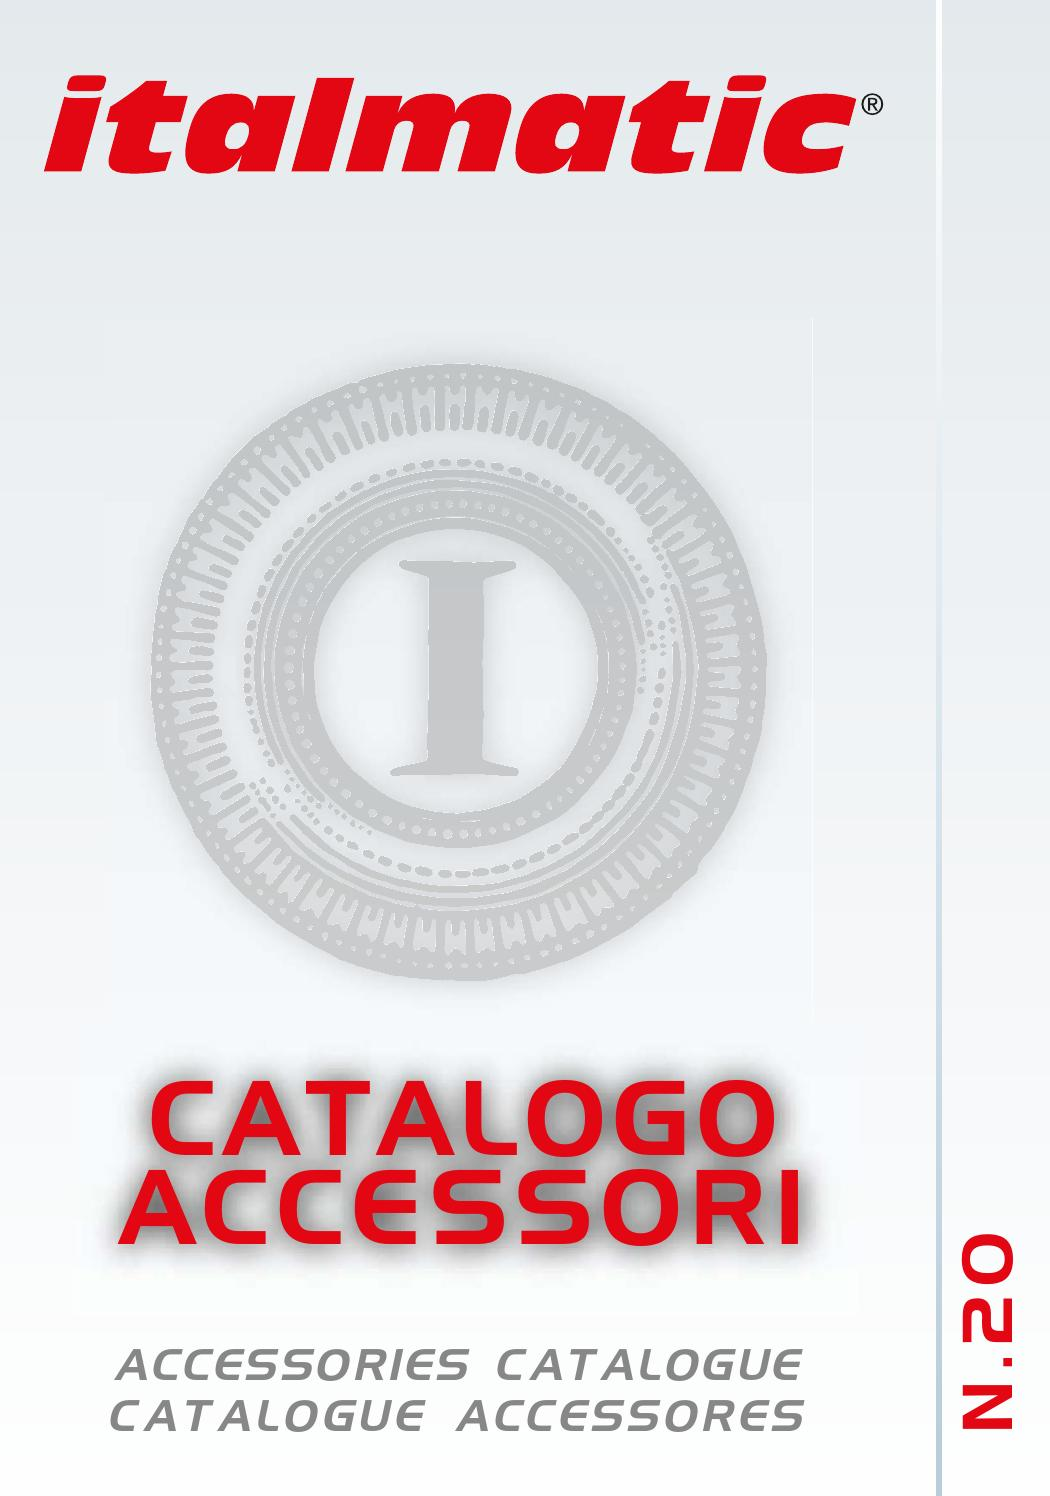 8 Removal Tool MERCEDES-BENZ 20 x 17mm HEX Alloy Ruota Dado Coperchi Bullone GRIGIO